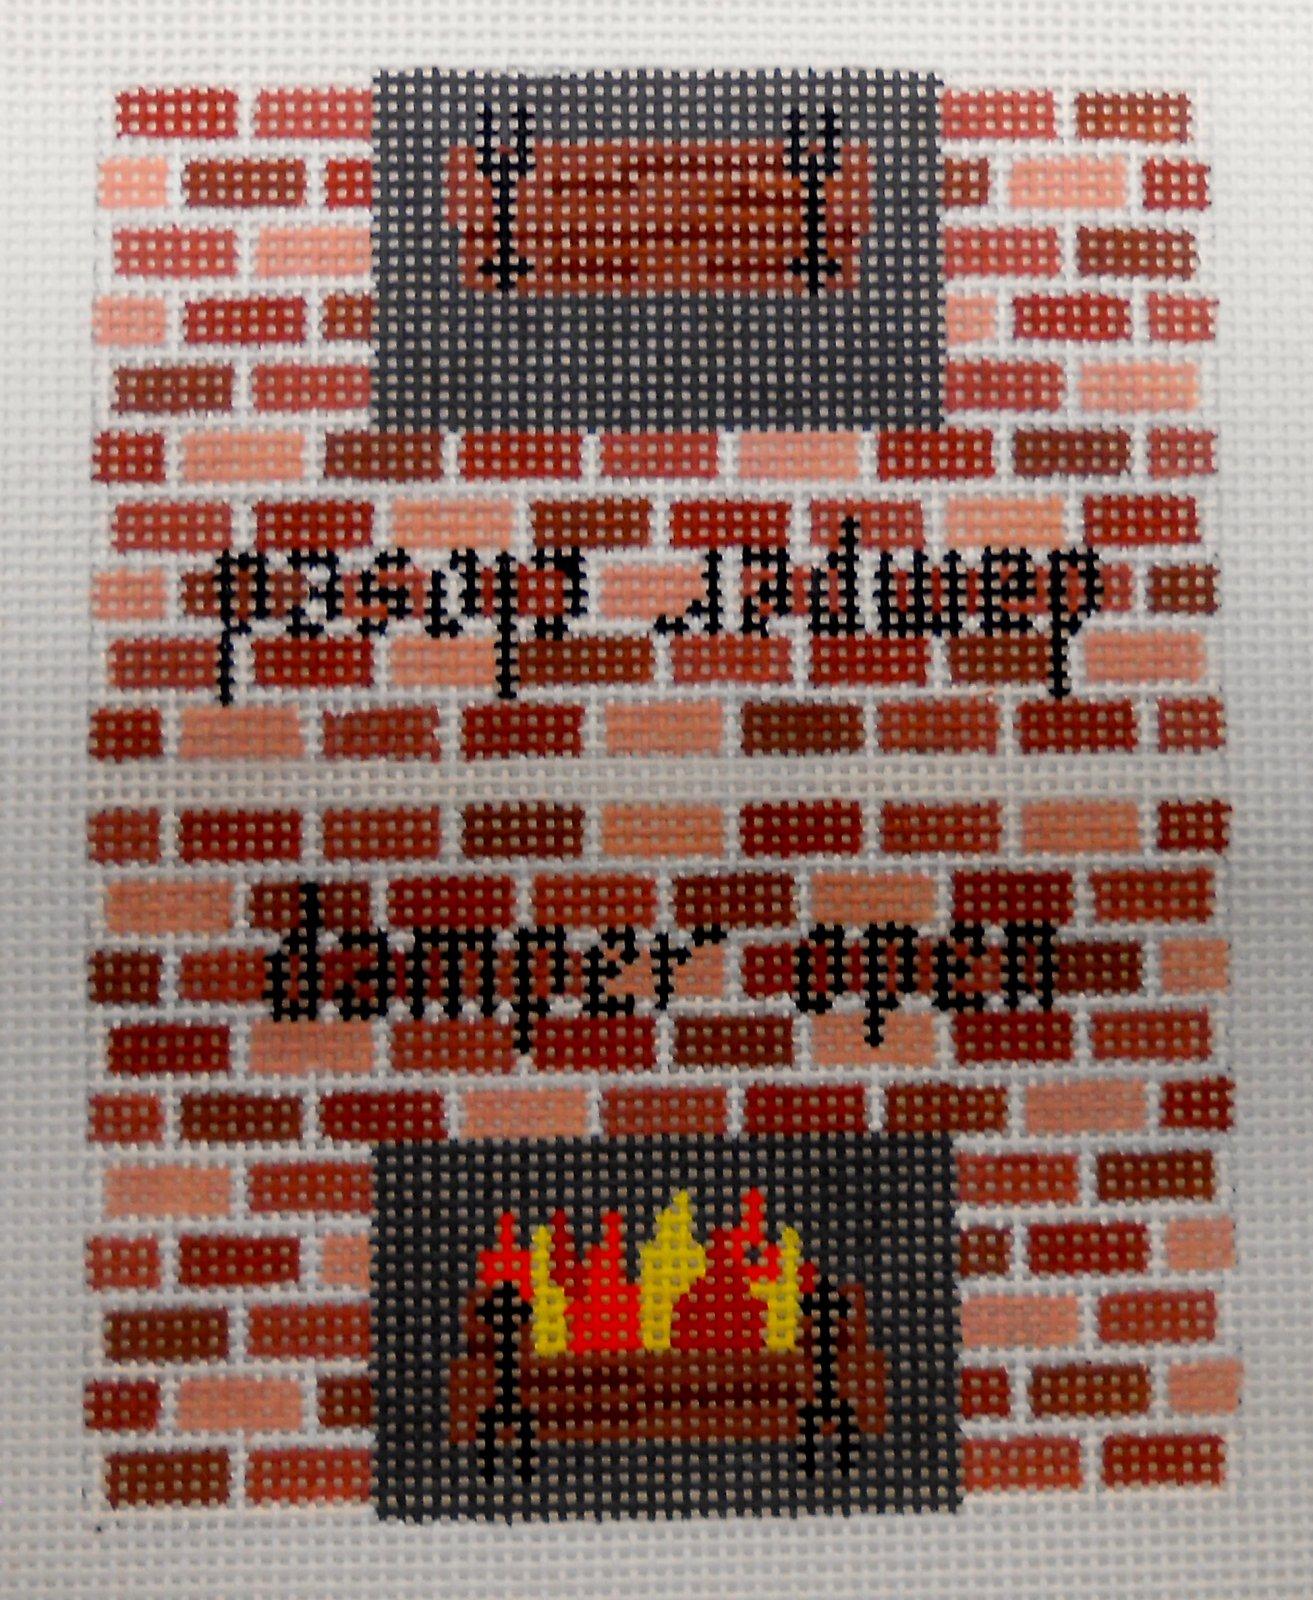 Damper Open/Closed - Fireplace